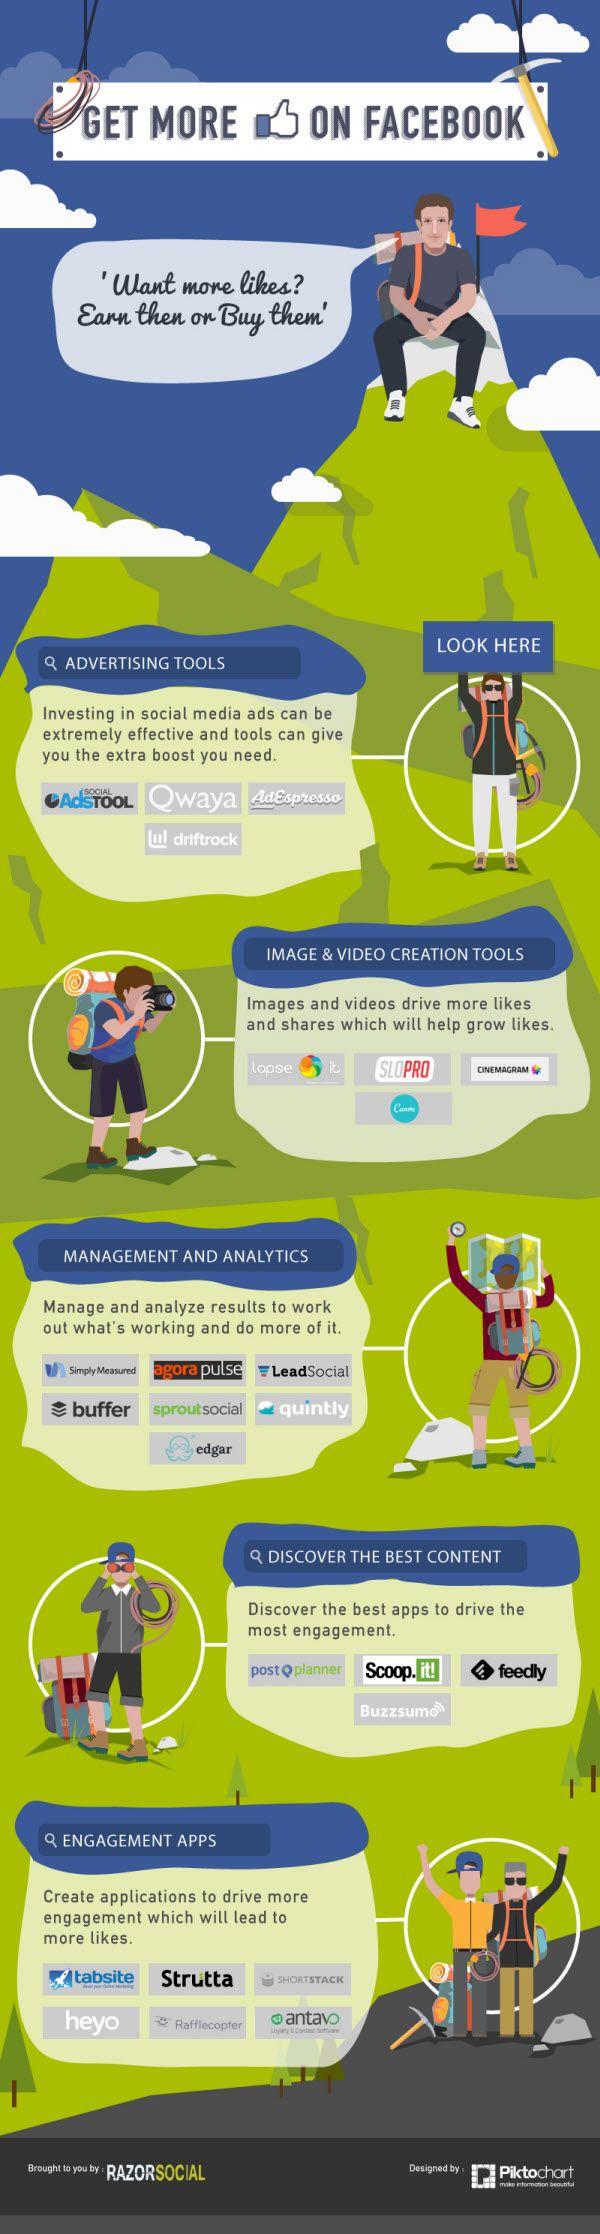 Infographic - Get More Likes on Facebook va Razor Social/Ian Cleary #Facebook #socialmedia